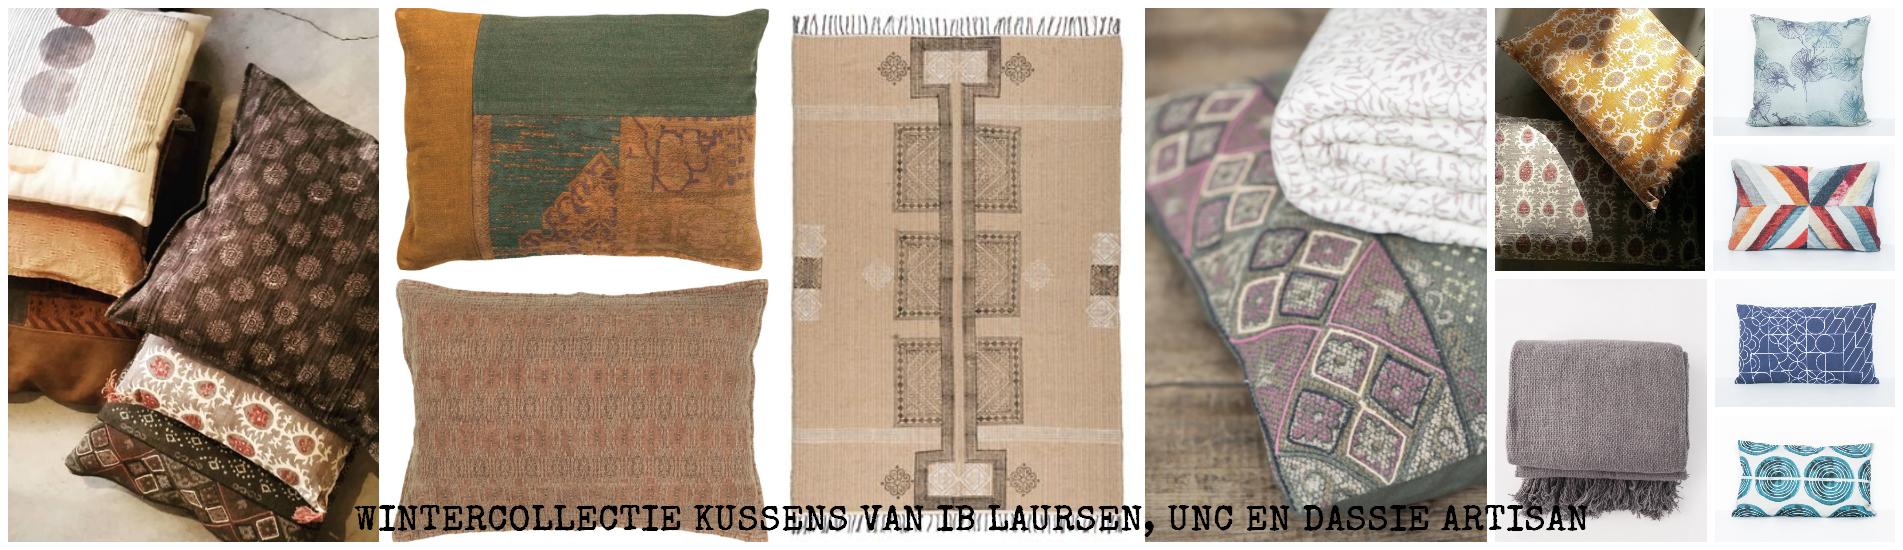 banner-kussens